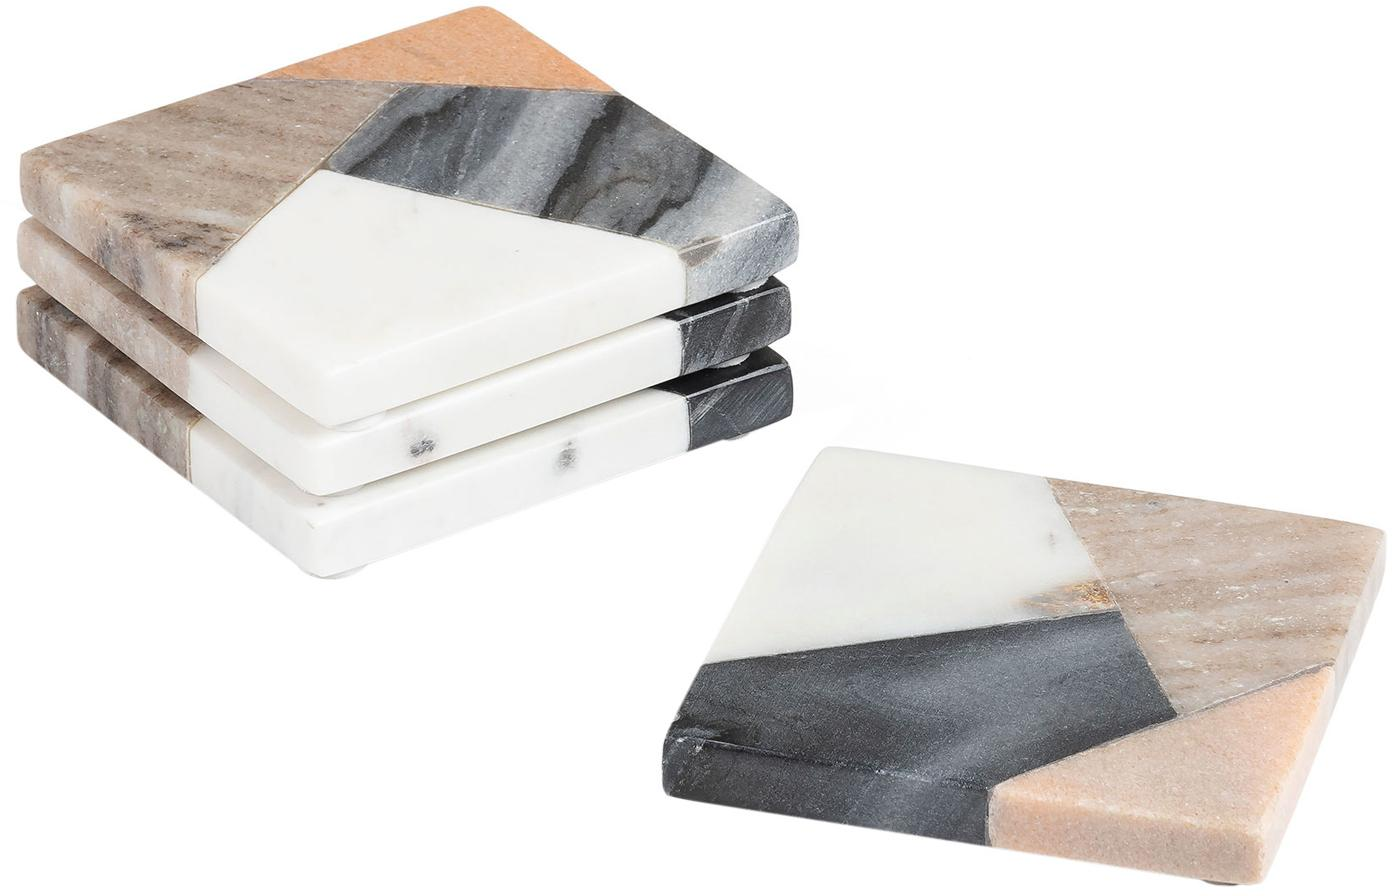 Set sottobicchieri in marmo Bradney, 4 pz., Ceramica, marmo, Multicolore, Larg. 10 x Prof. 10 cm